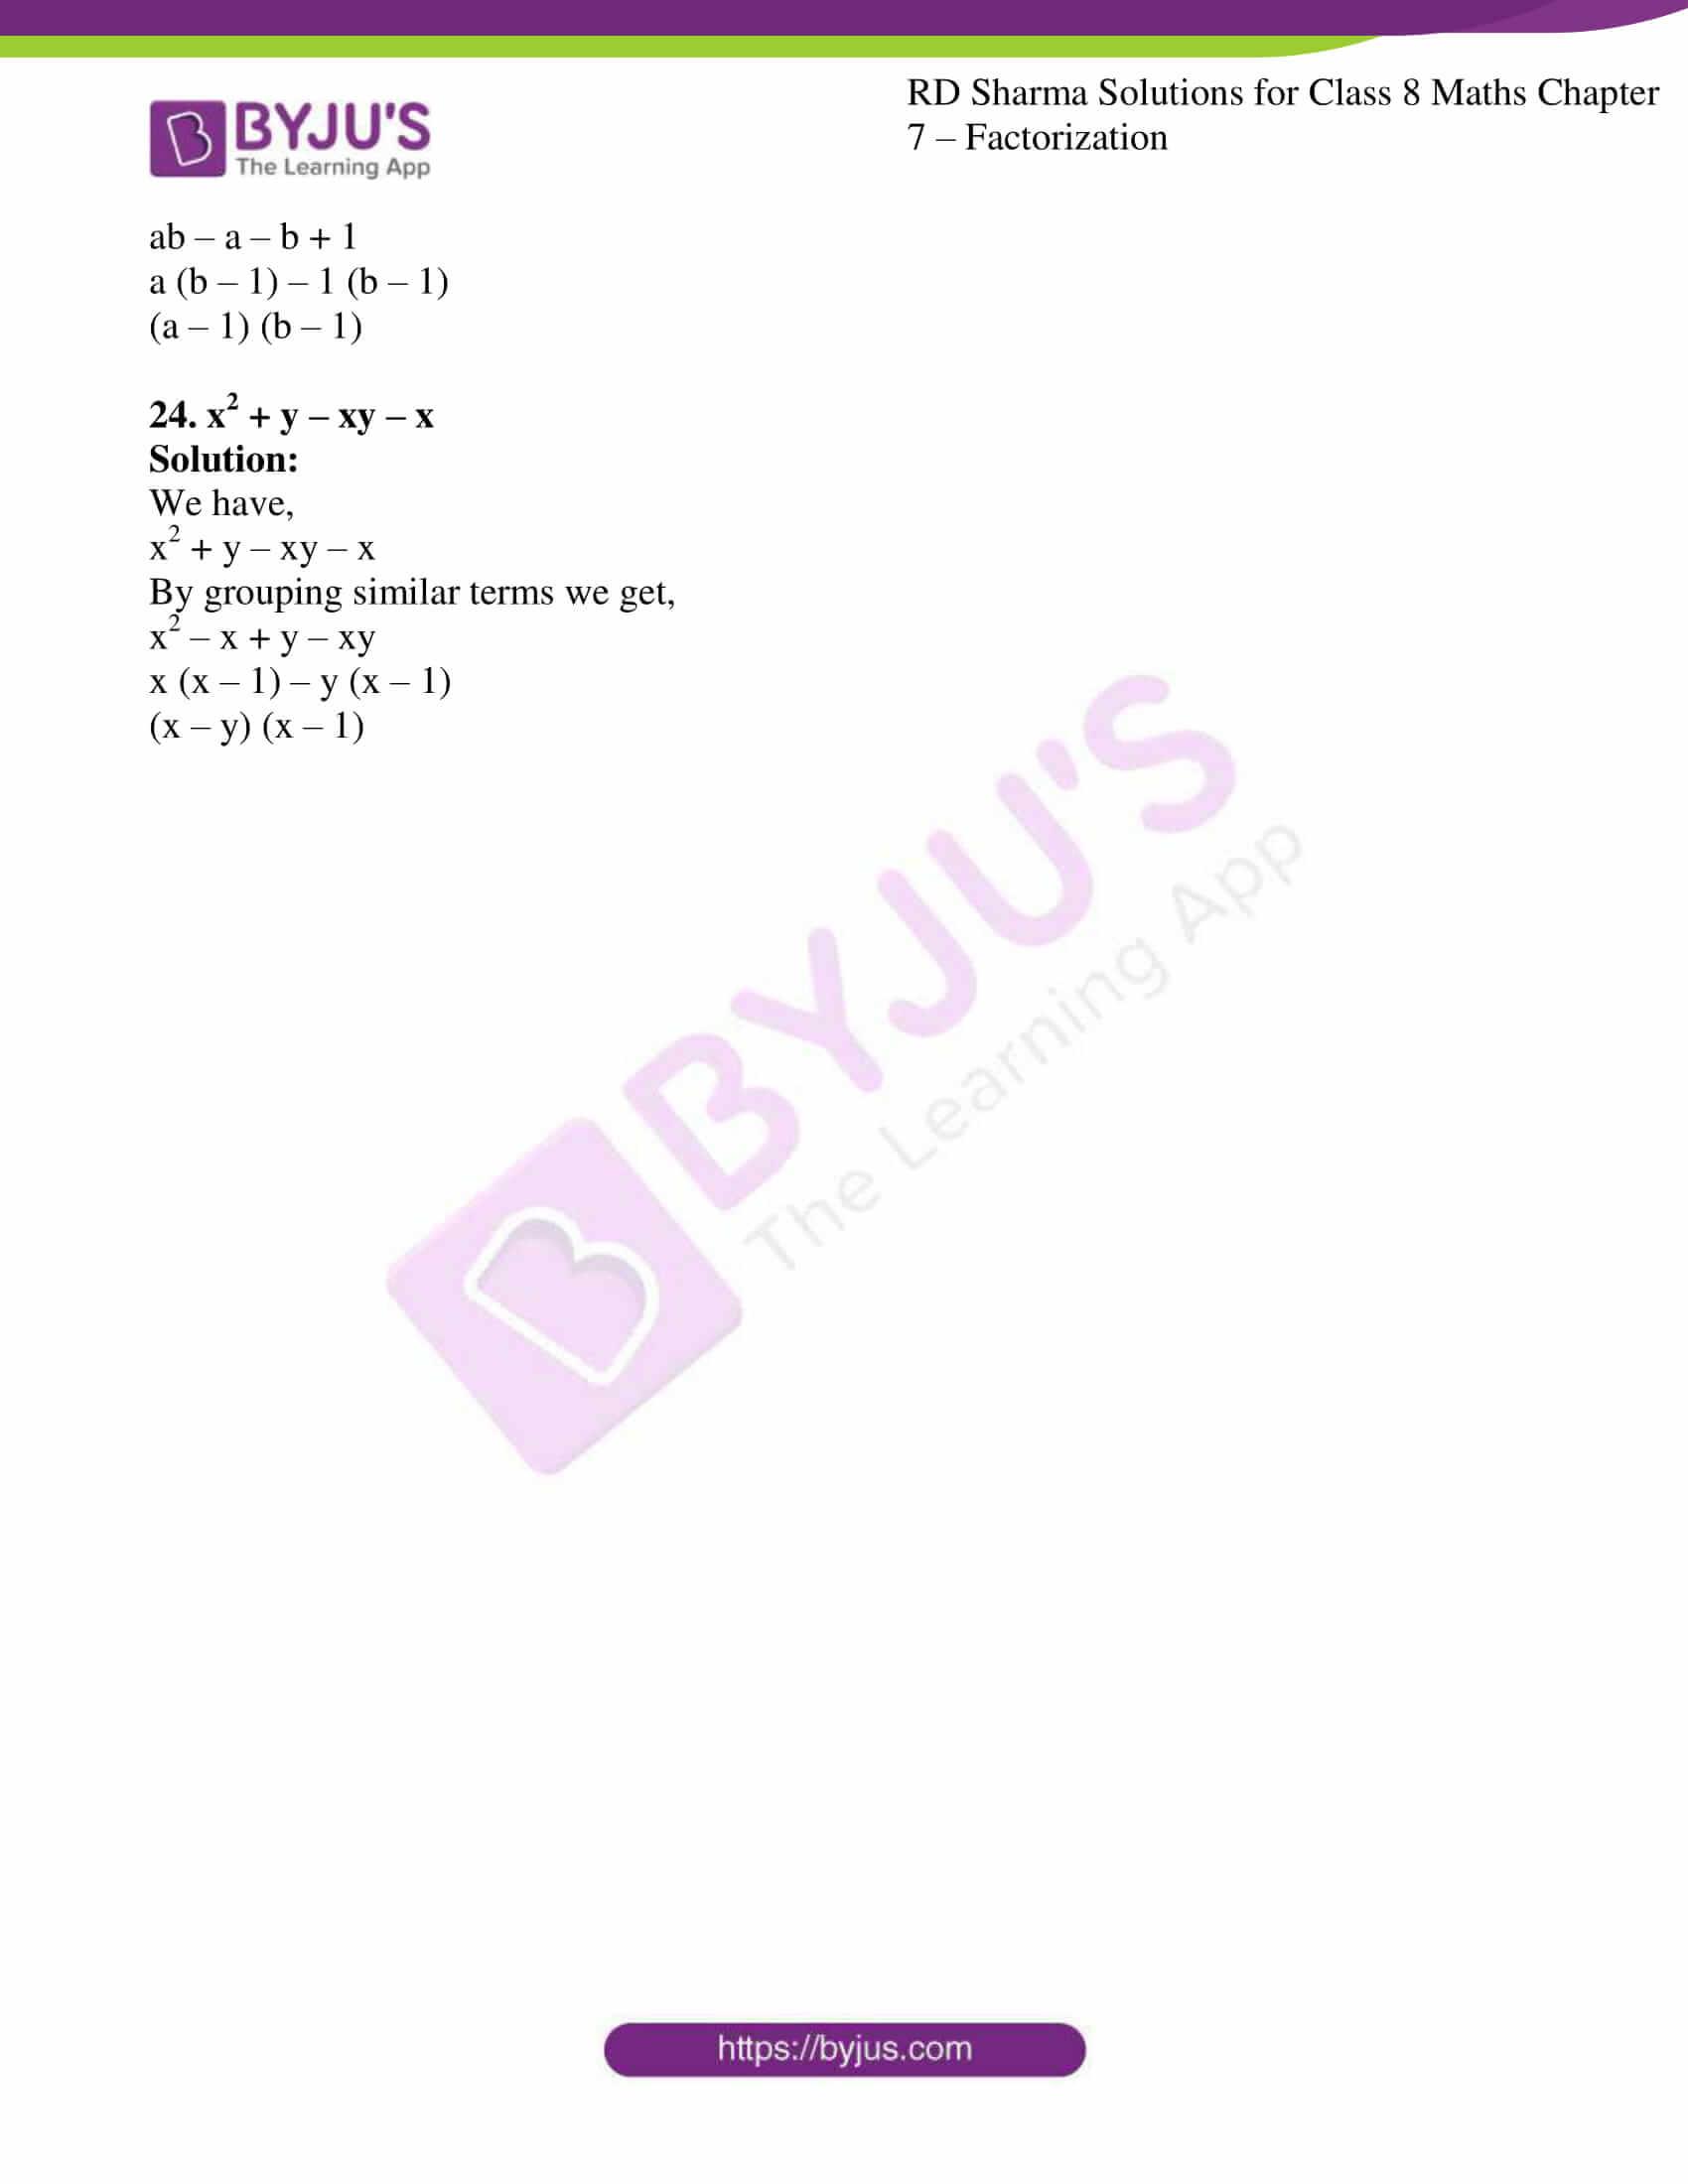 rd sharma class 8 maths chapter 7 exercise 4 6